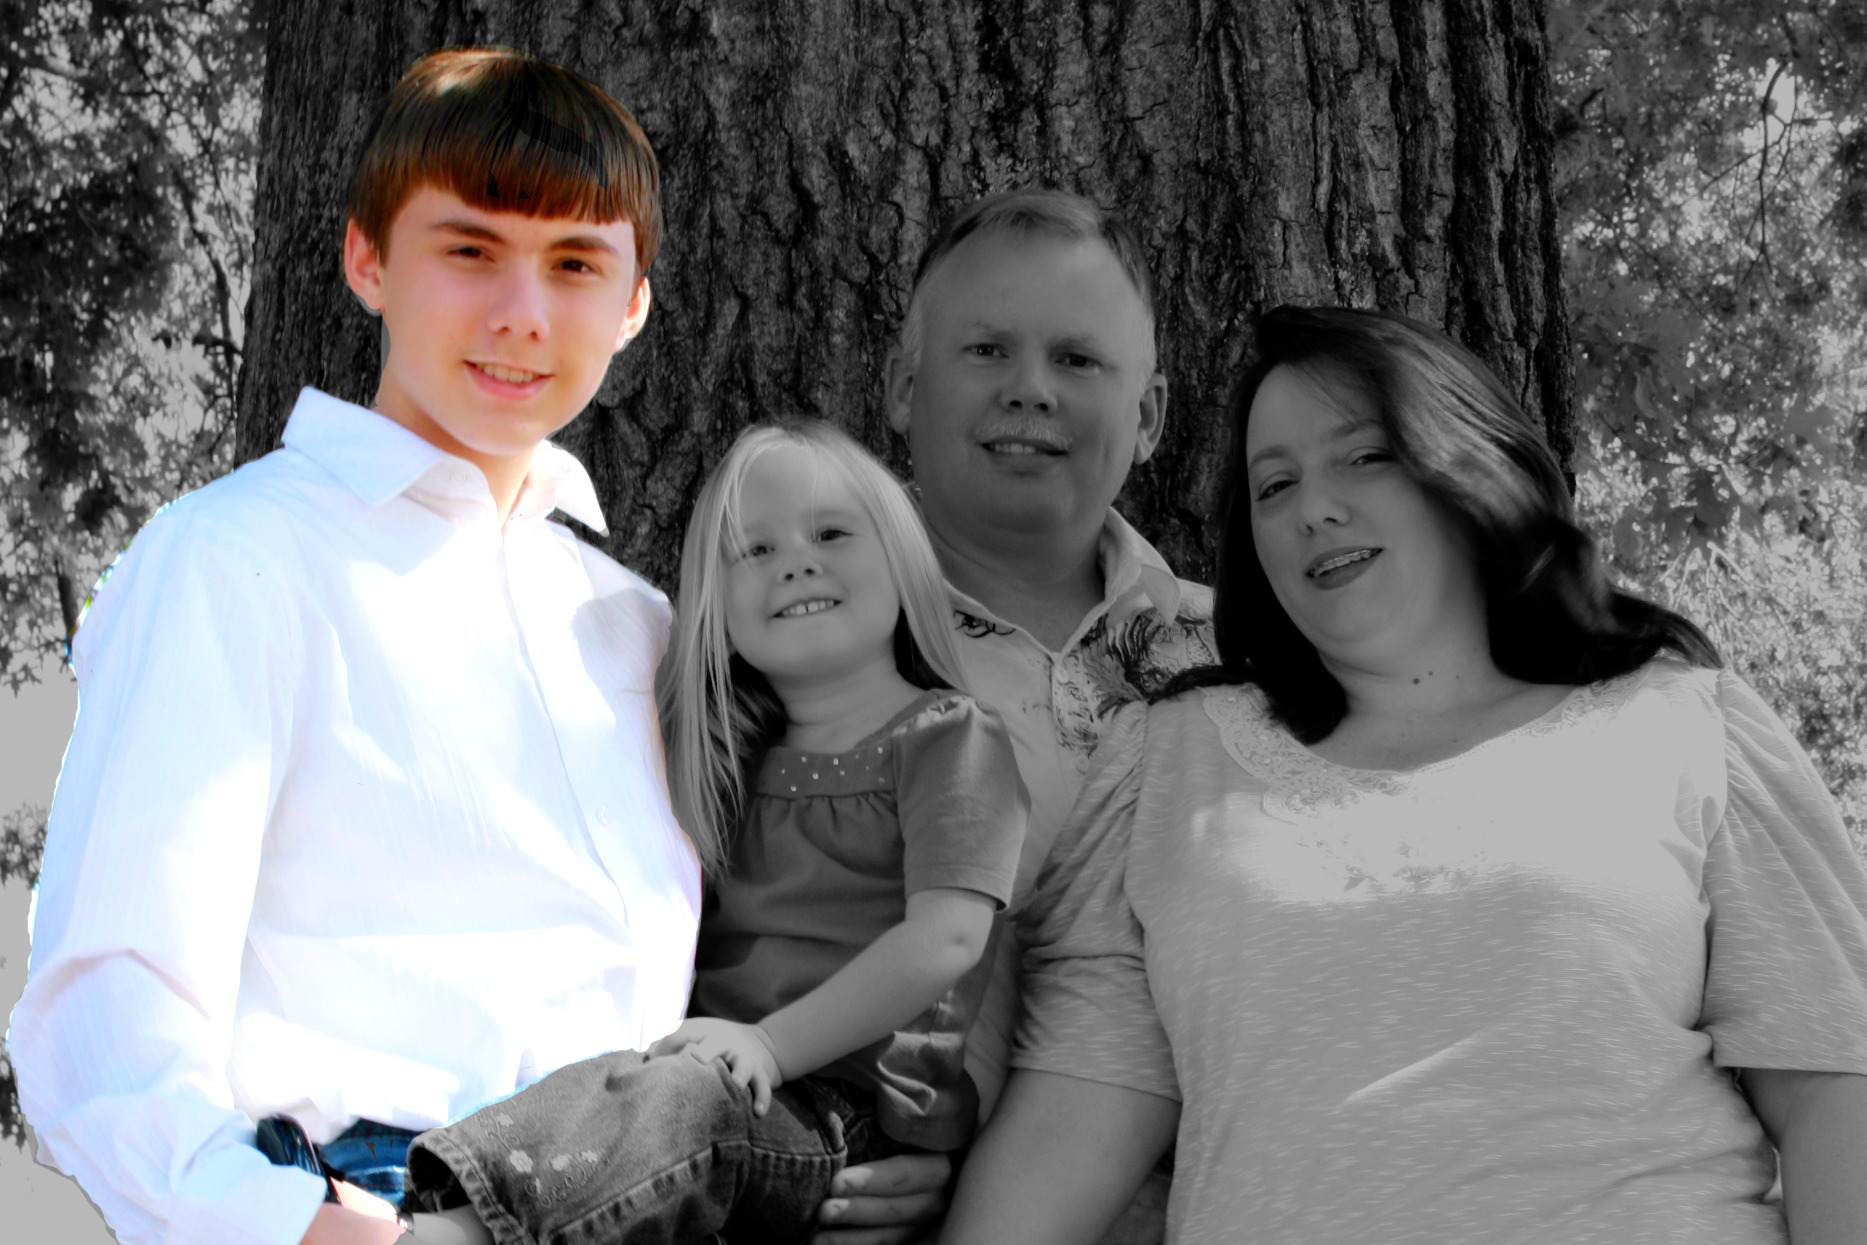 Caleb Family Portrait Overlay